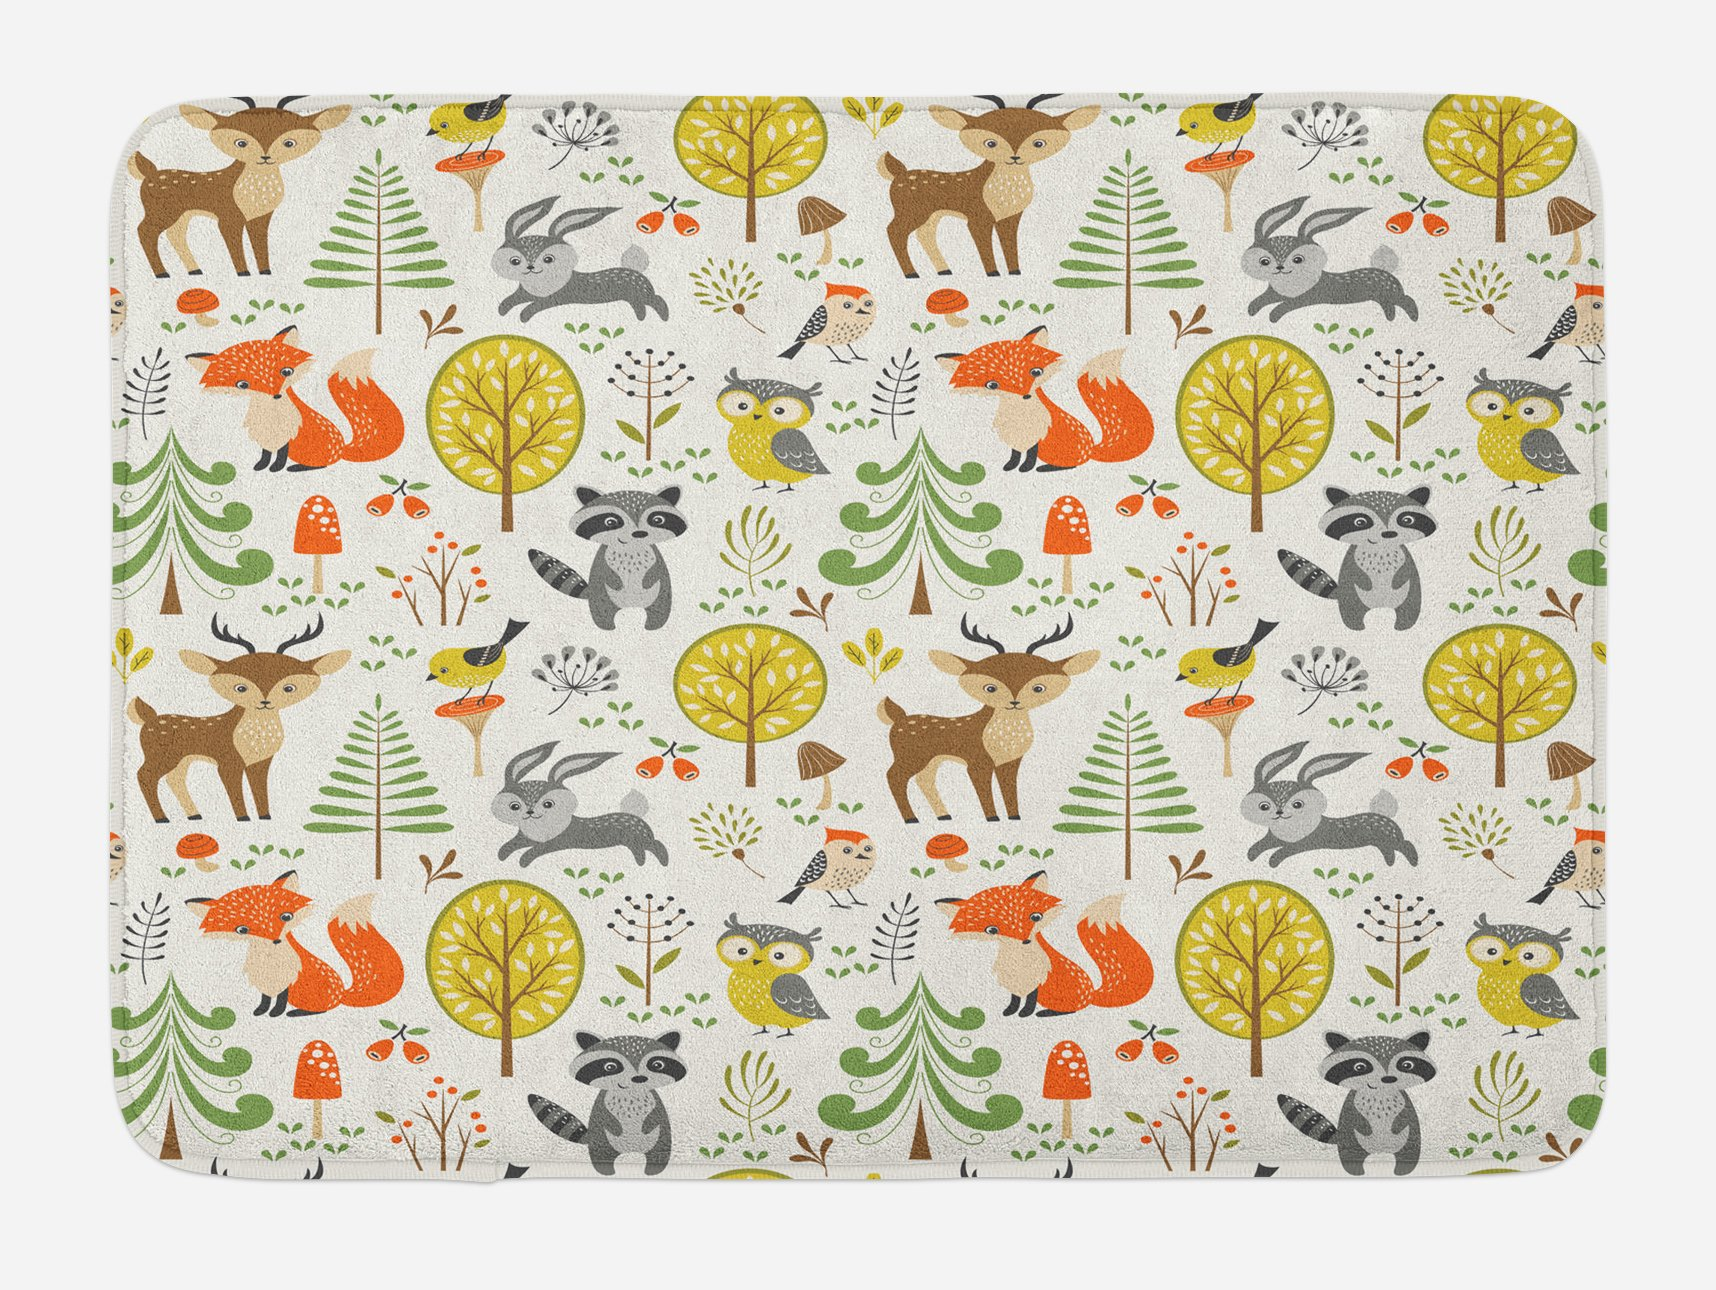 Lunarable Animals Bath Mat, Woodland Forest Animals Trees Birds Owls Fox Bunny Deer Raccoon Mushroom Print, Plush Bathroom Decor Mat with Non Slip Backing, 29.5 W X 17.5 W Inches, Multicolor